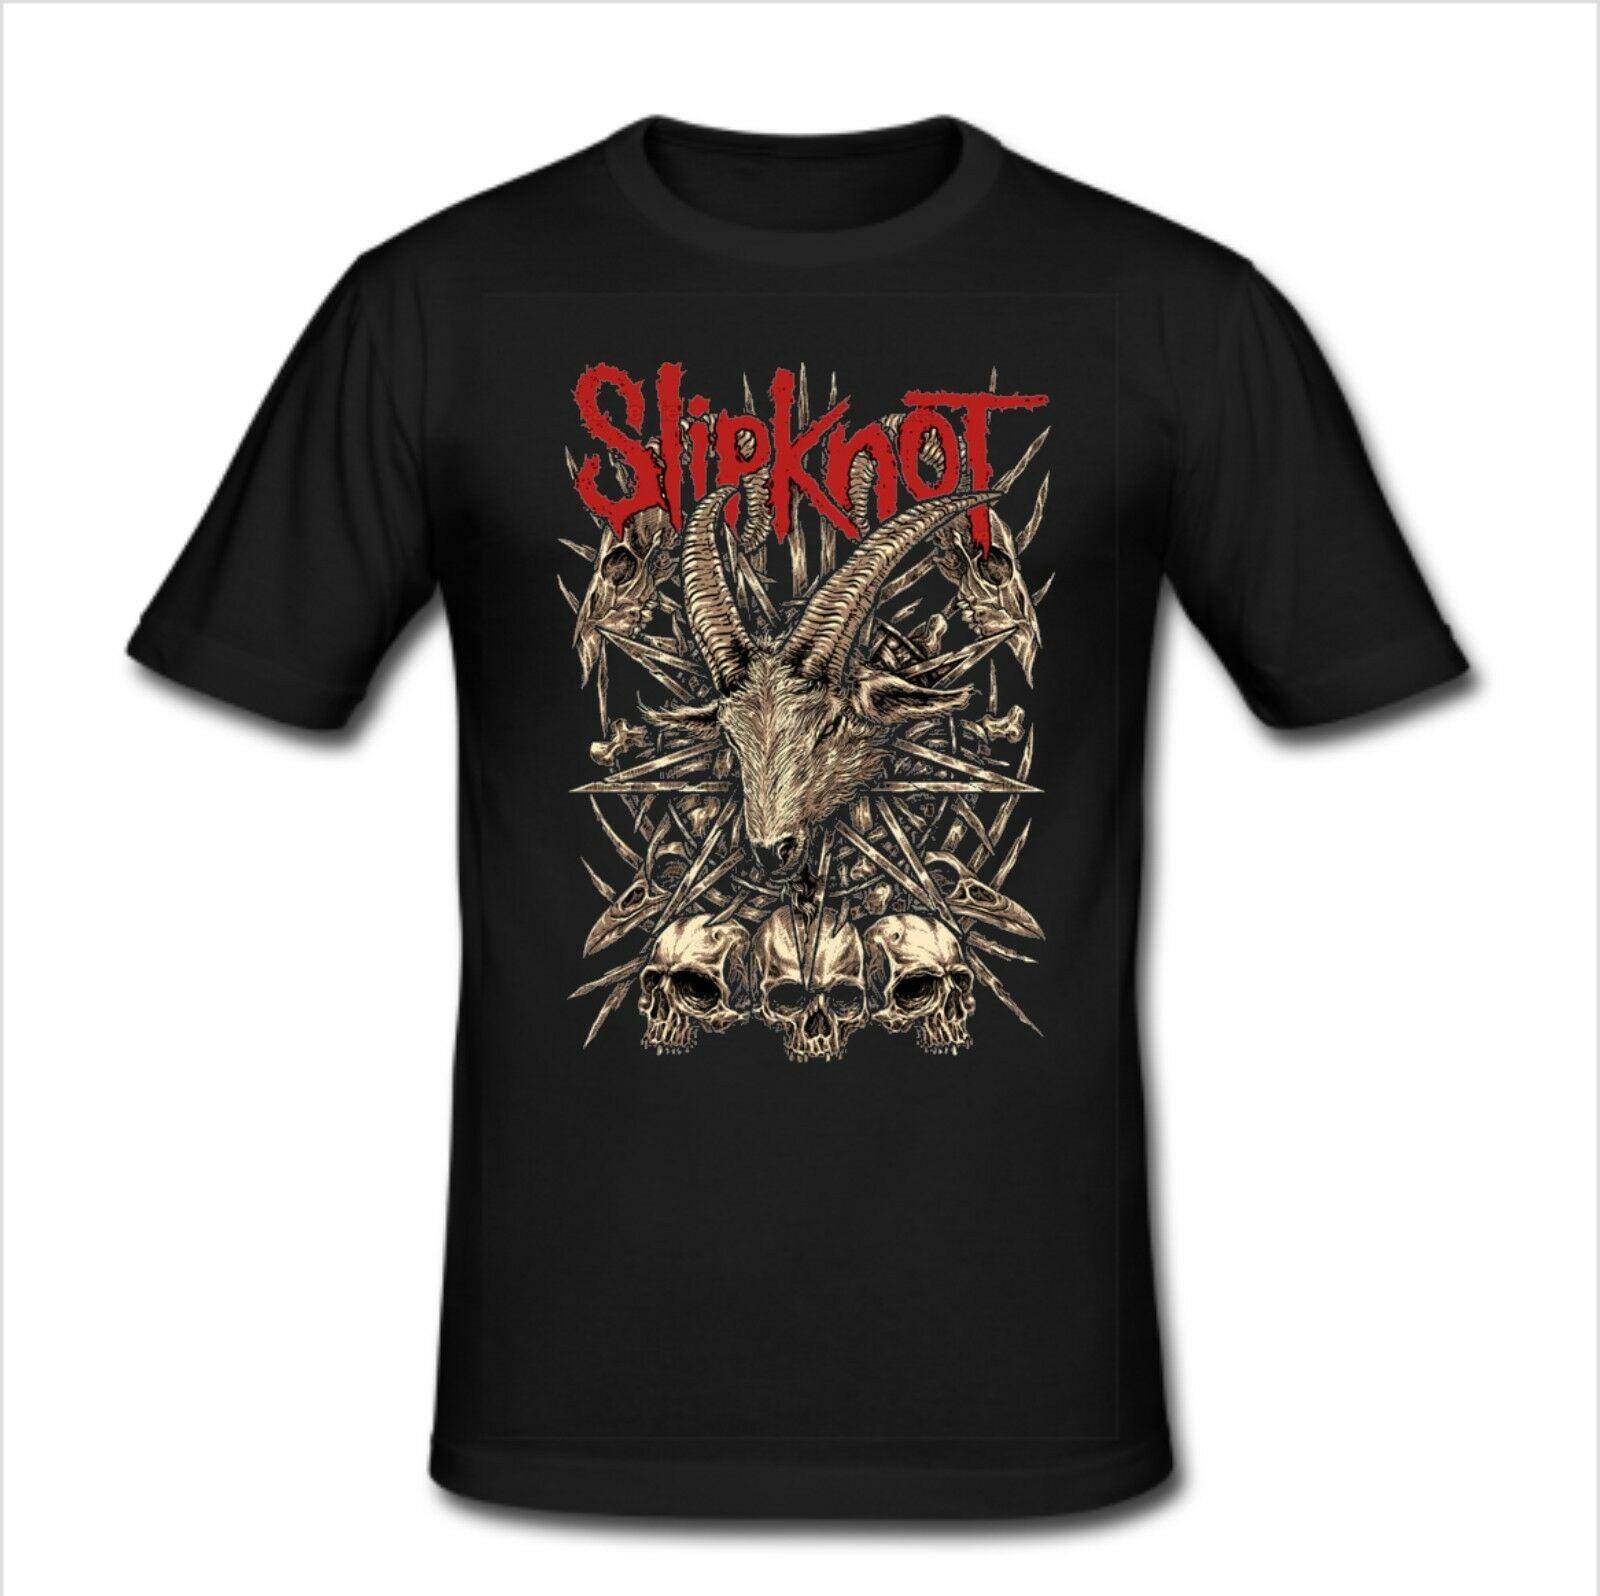 Mens Slim Fit T shirt size XL - Slipknot Heavy Metal Band